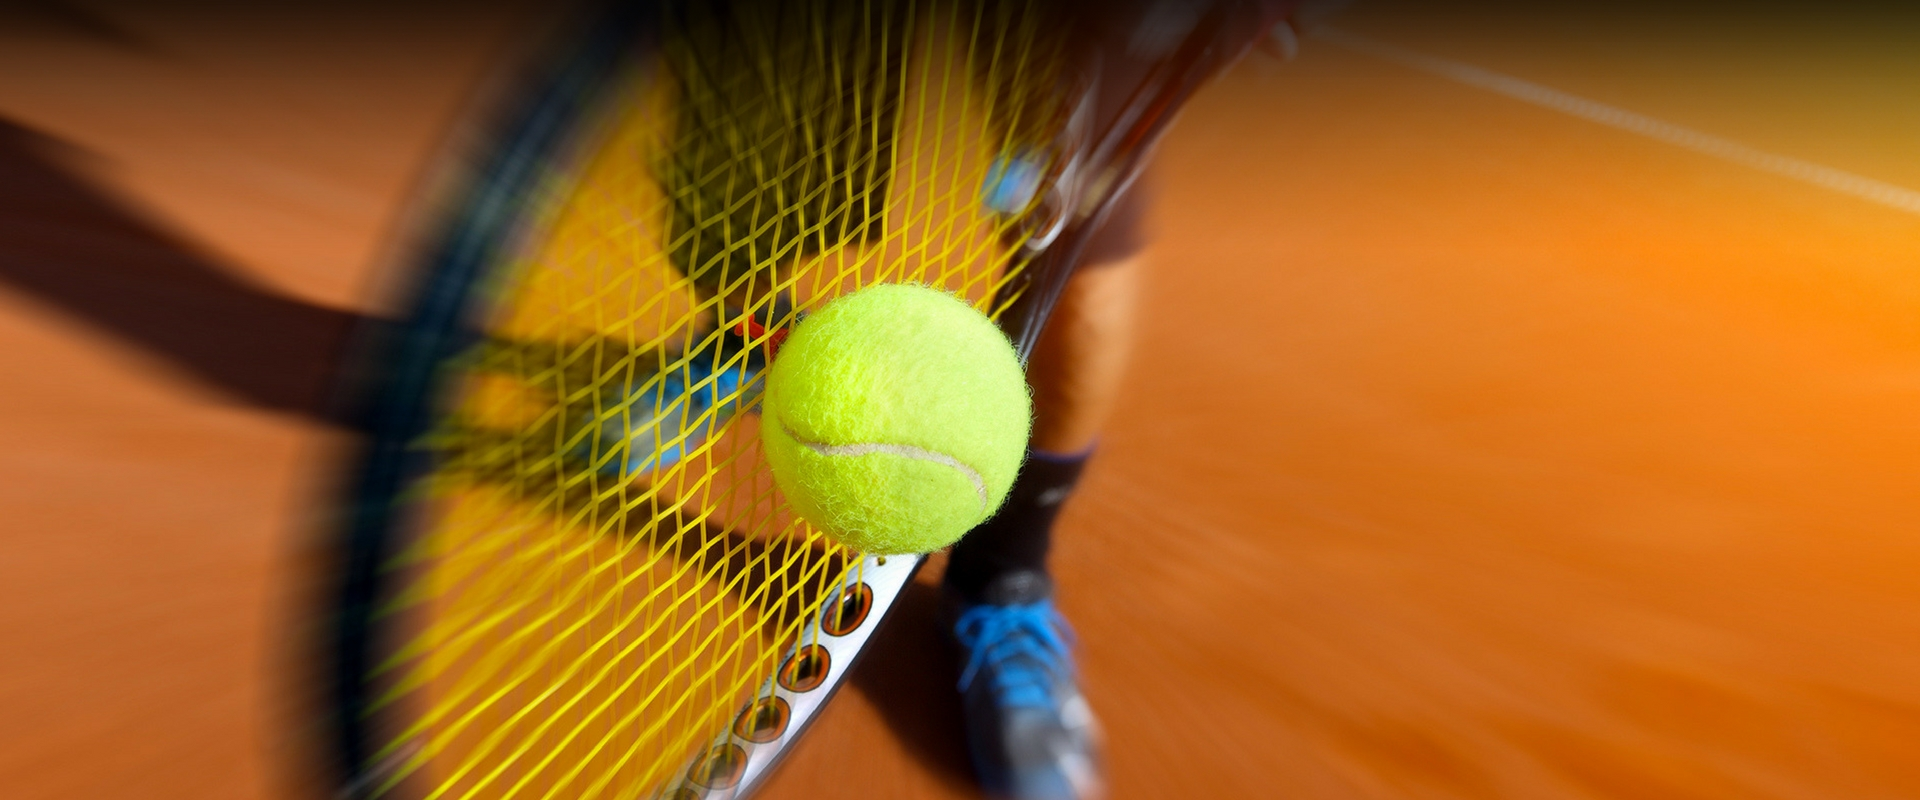 tennis e fan engagement